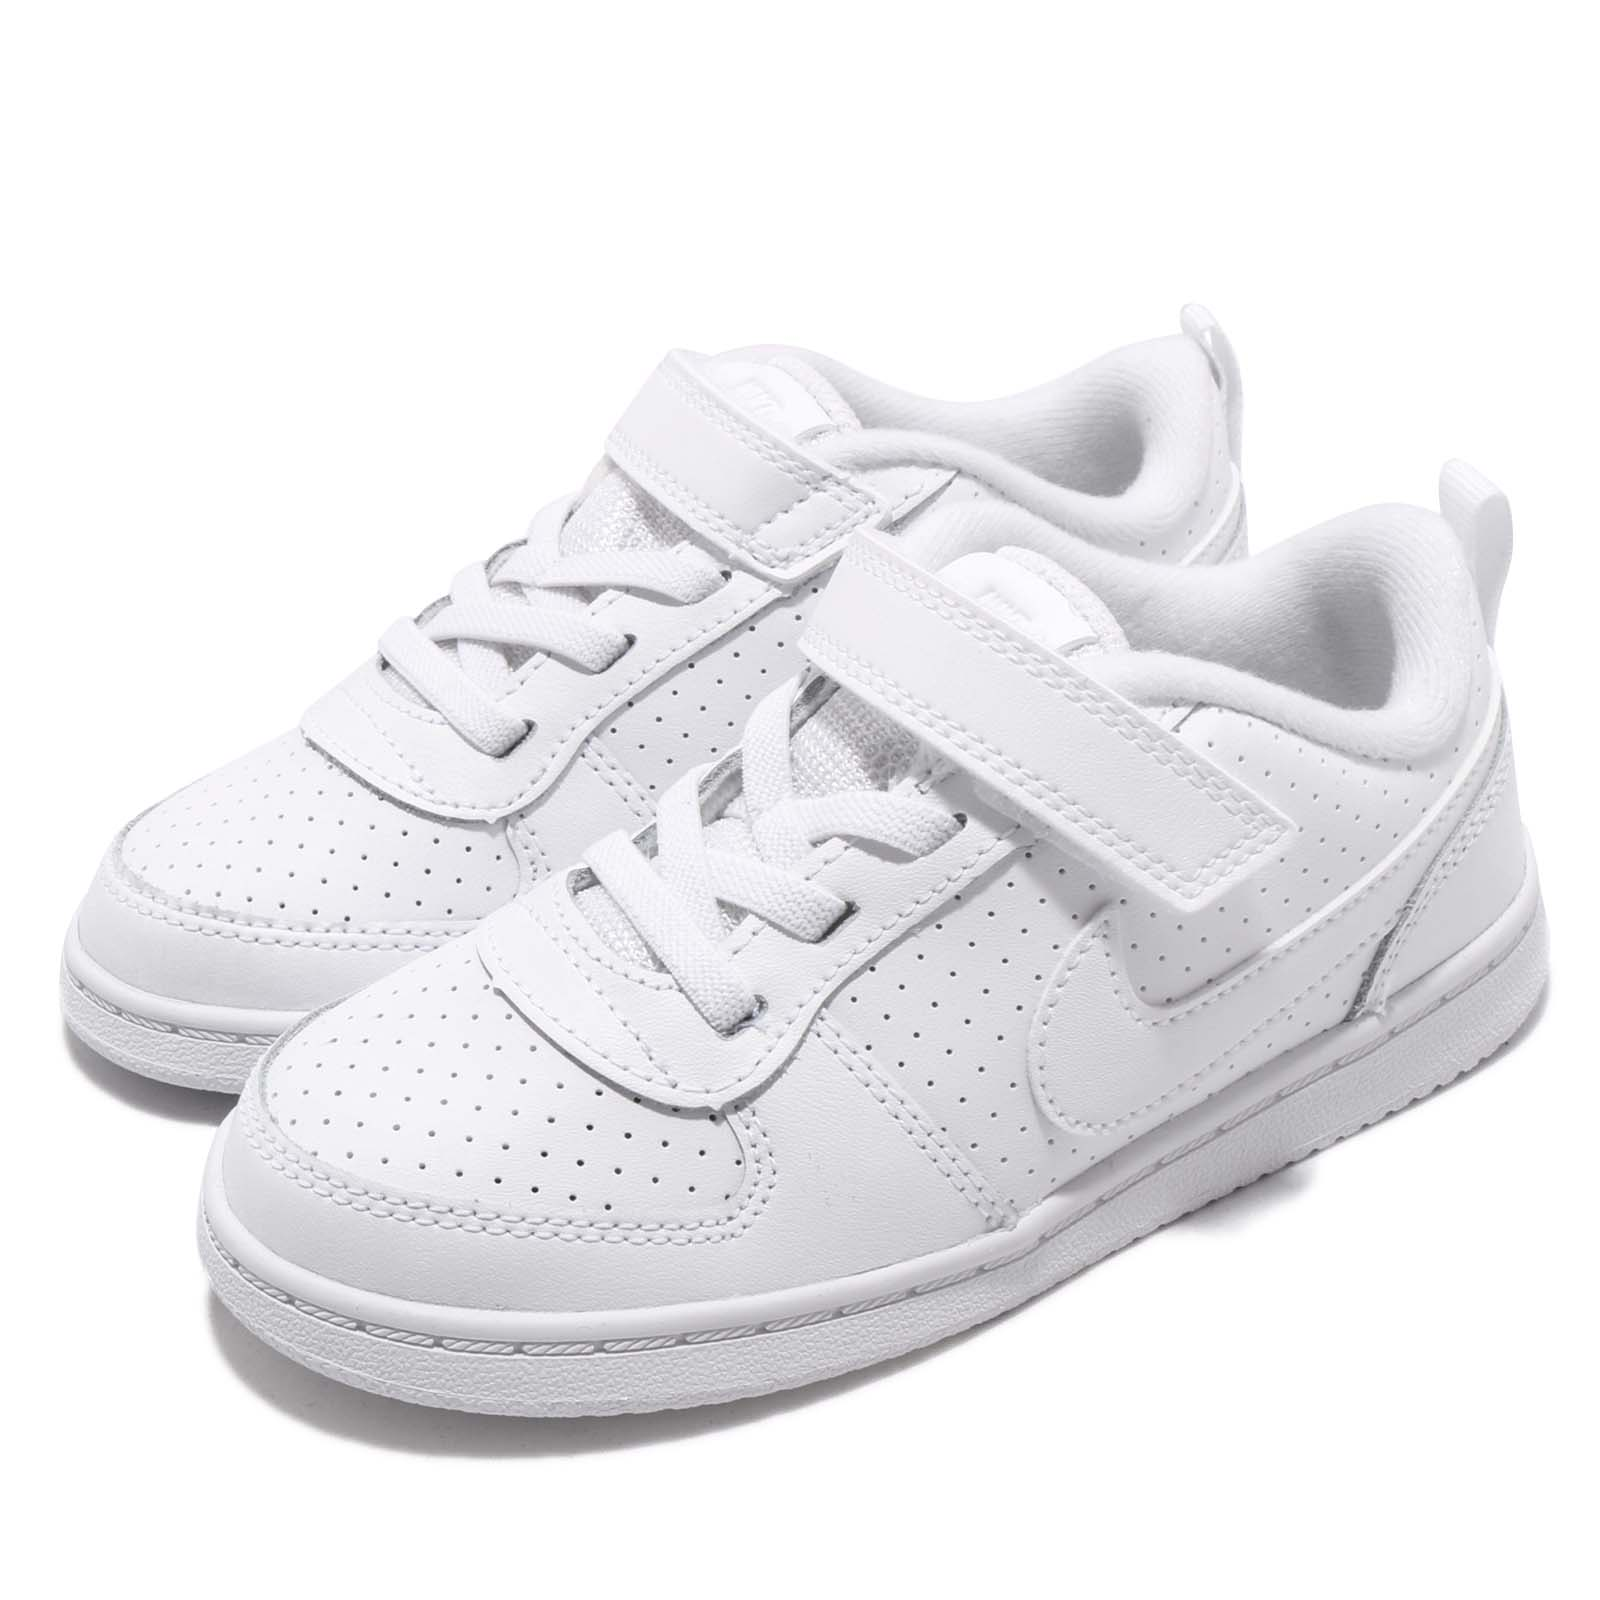 Nike 休閒鞋 Court Borough 童鞋 870029-100